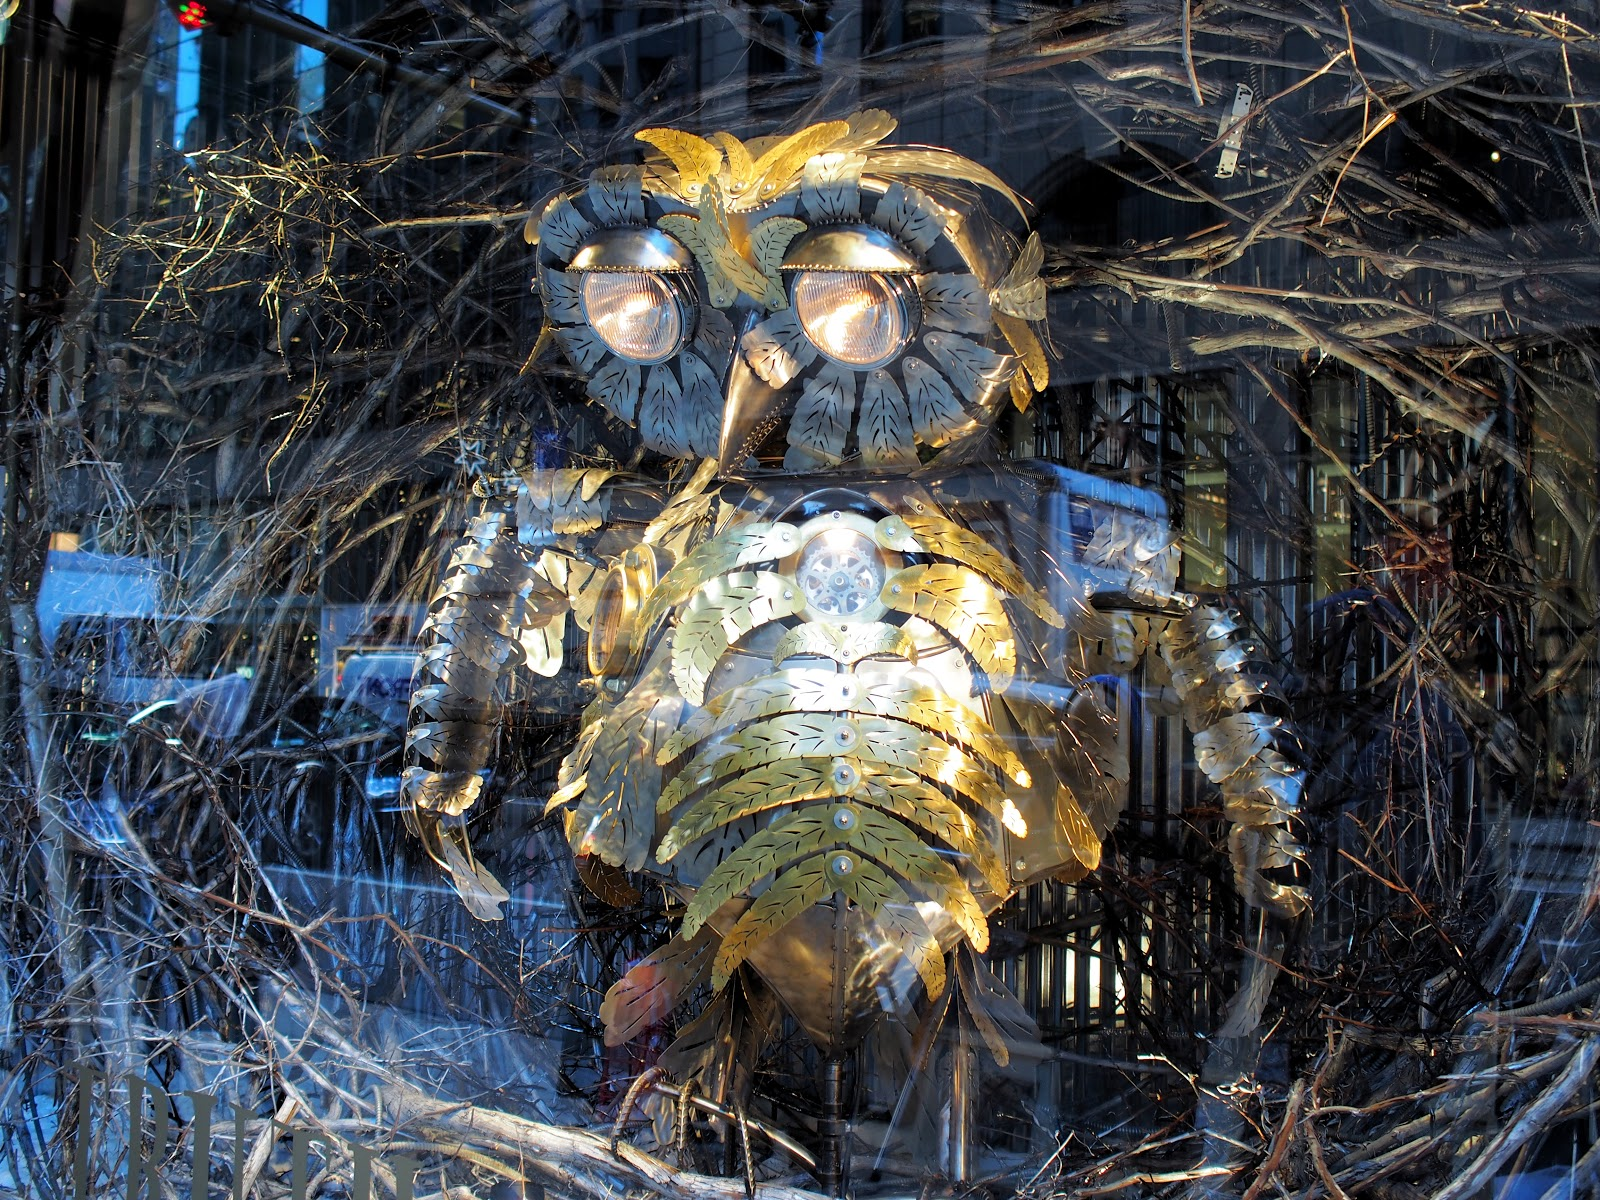 Holiday Owl #HolidayOwl #barneys #holidaysinNYC #BazLuhrmann #besttimeoftheyear #celebrate ©2014 Nancy Lundebjerg